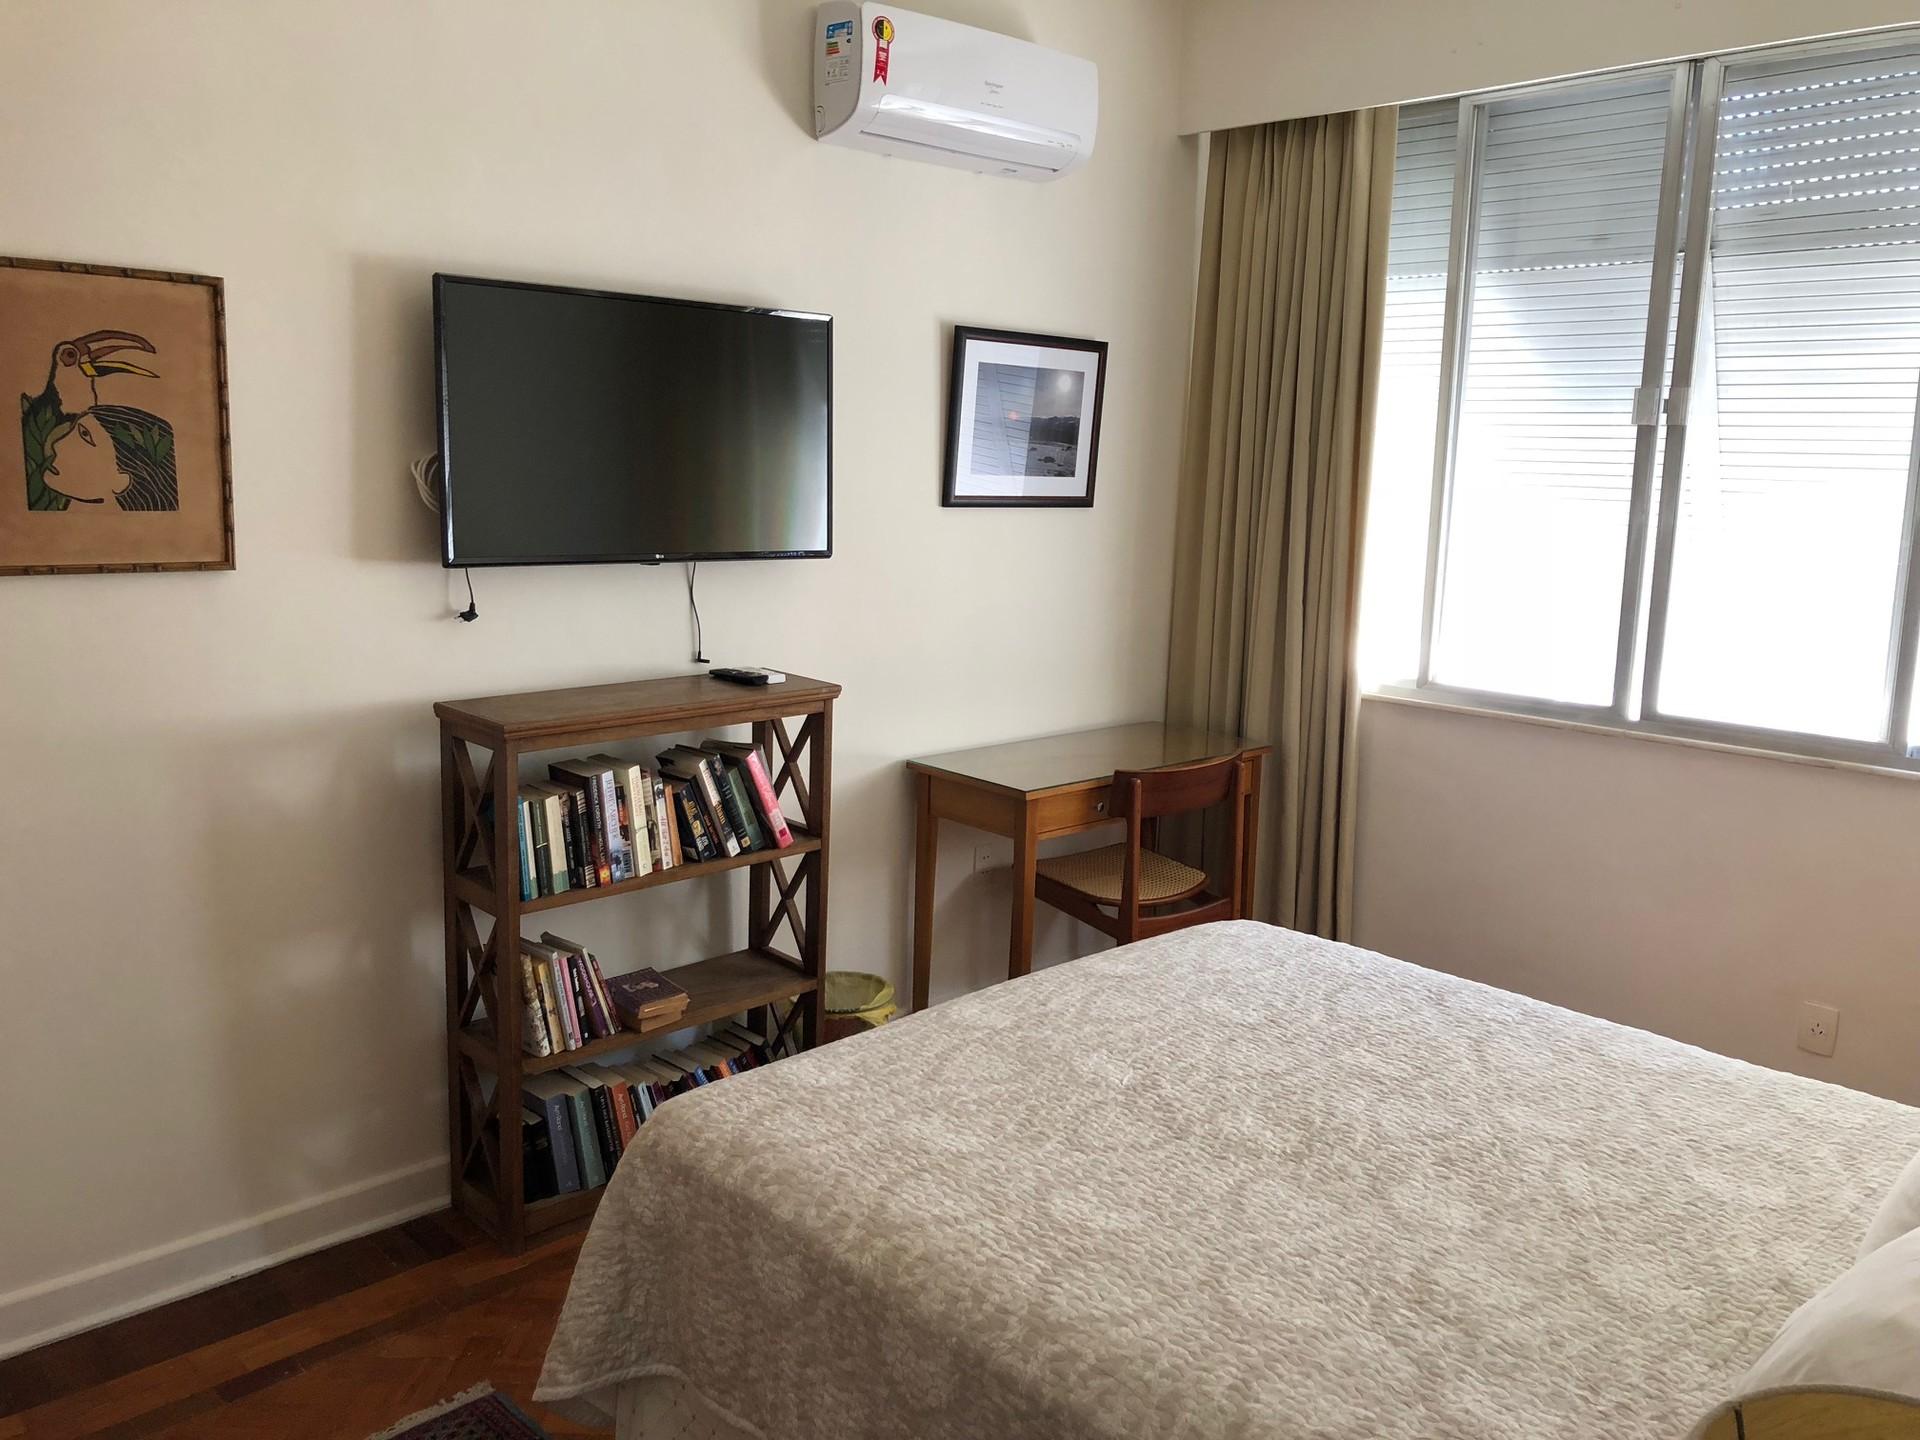 spacious-comfortable-safe-room-copacabana-a63b2af8f13b81b10df5536c1ac483a6